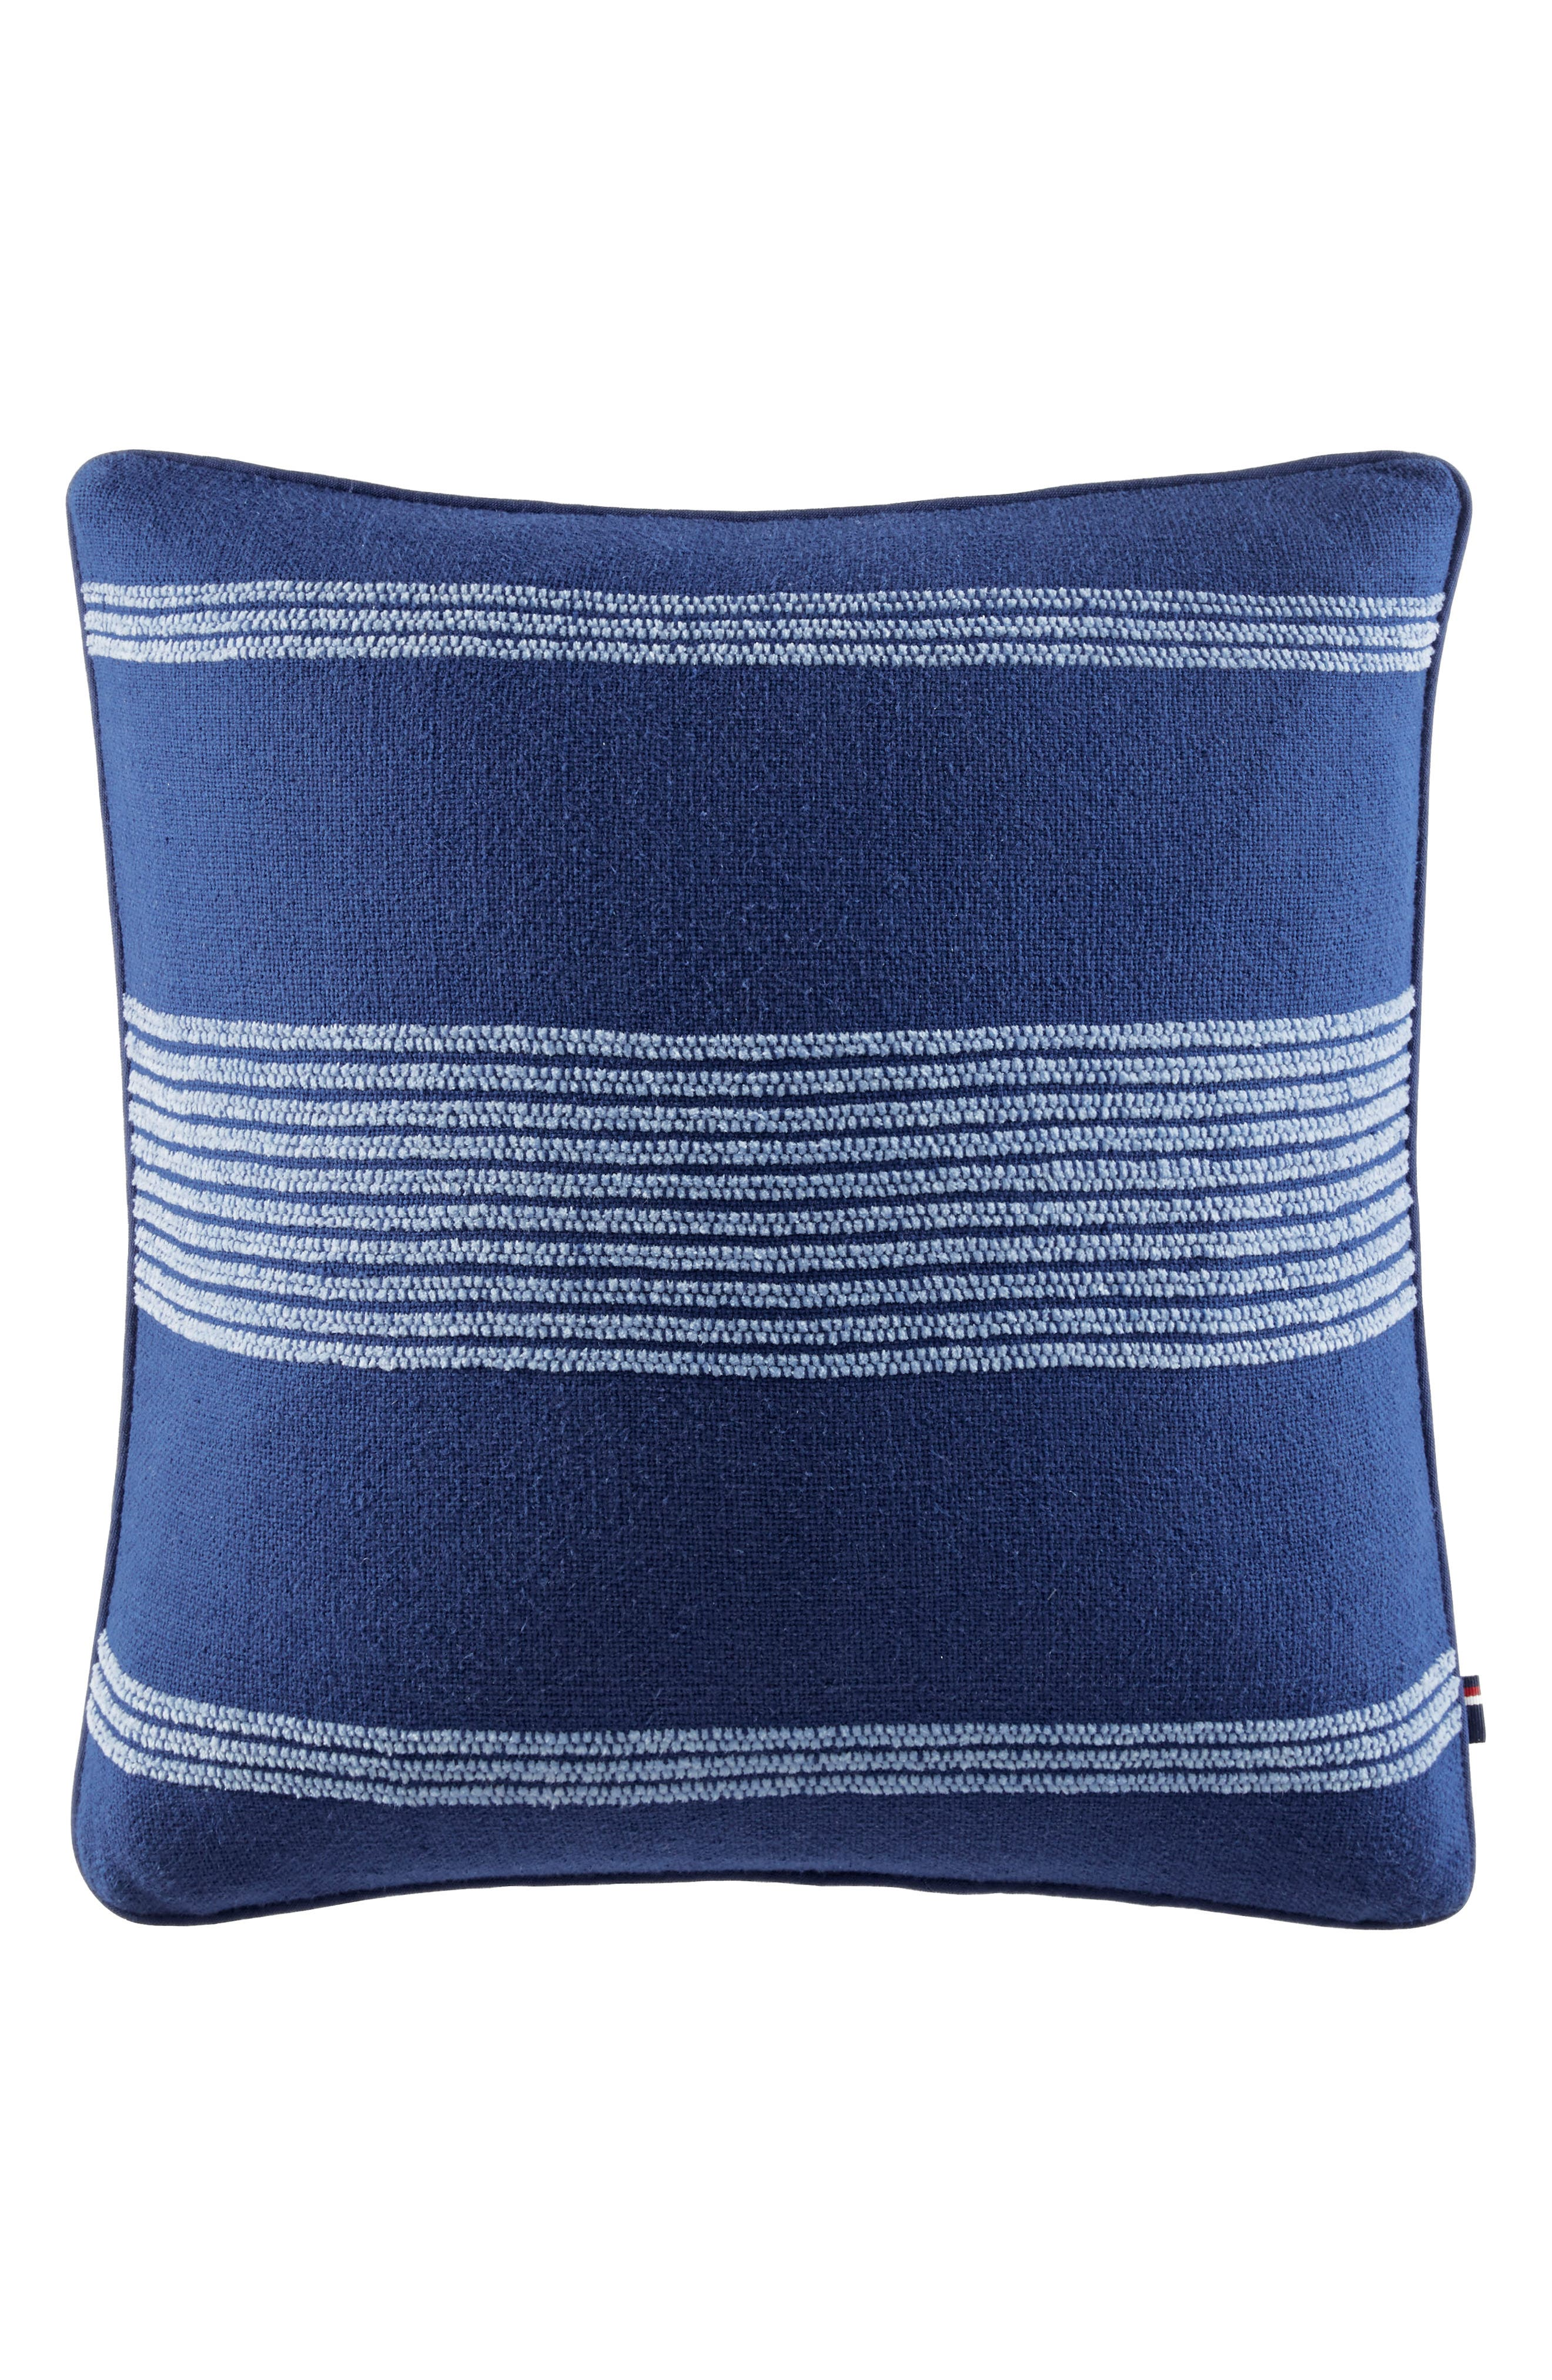 Pacific Horizon Accent Pillow,                             Main thumbnail 1, color,                             400